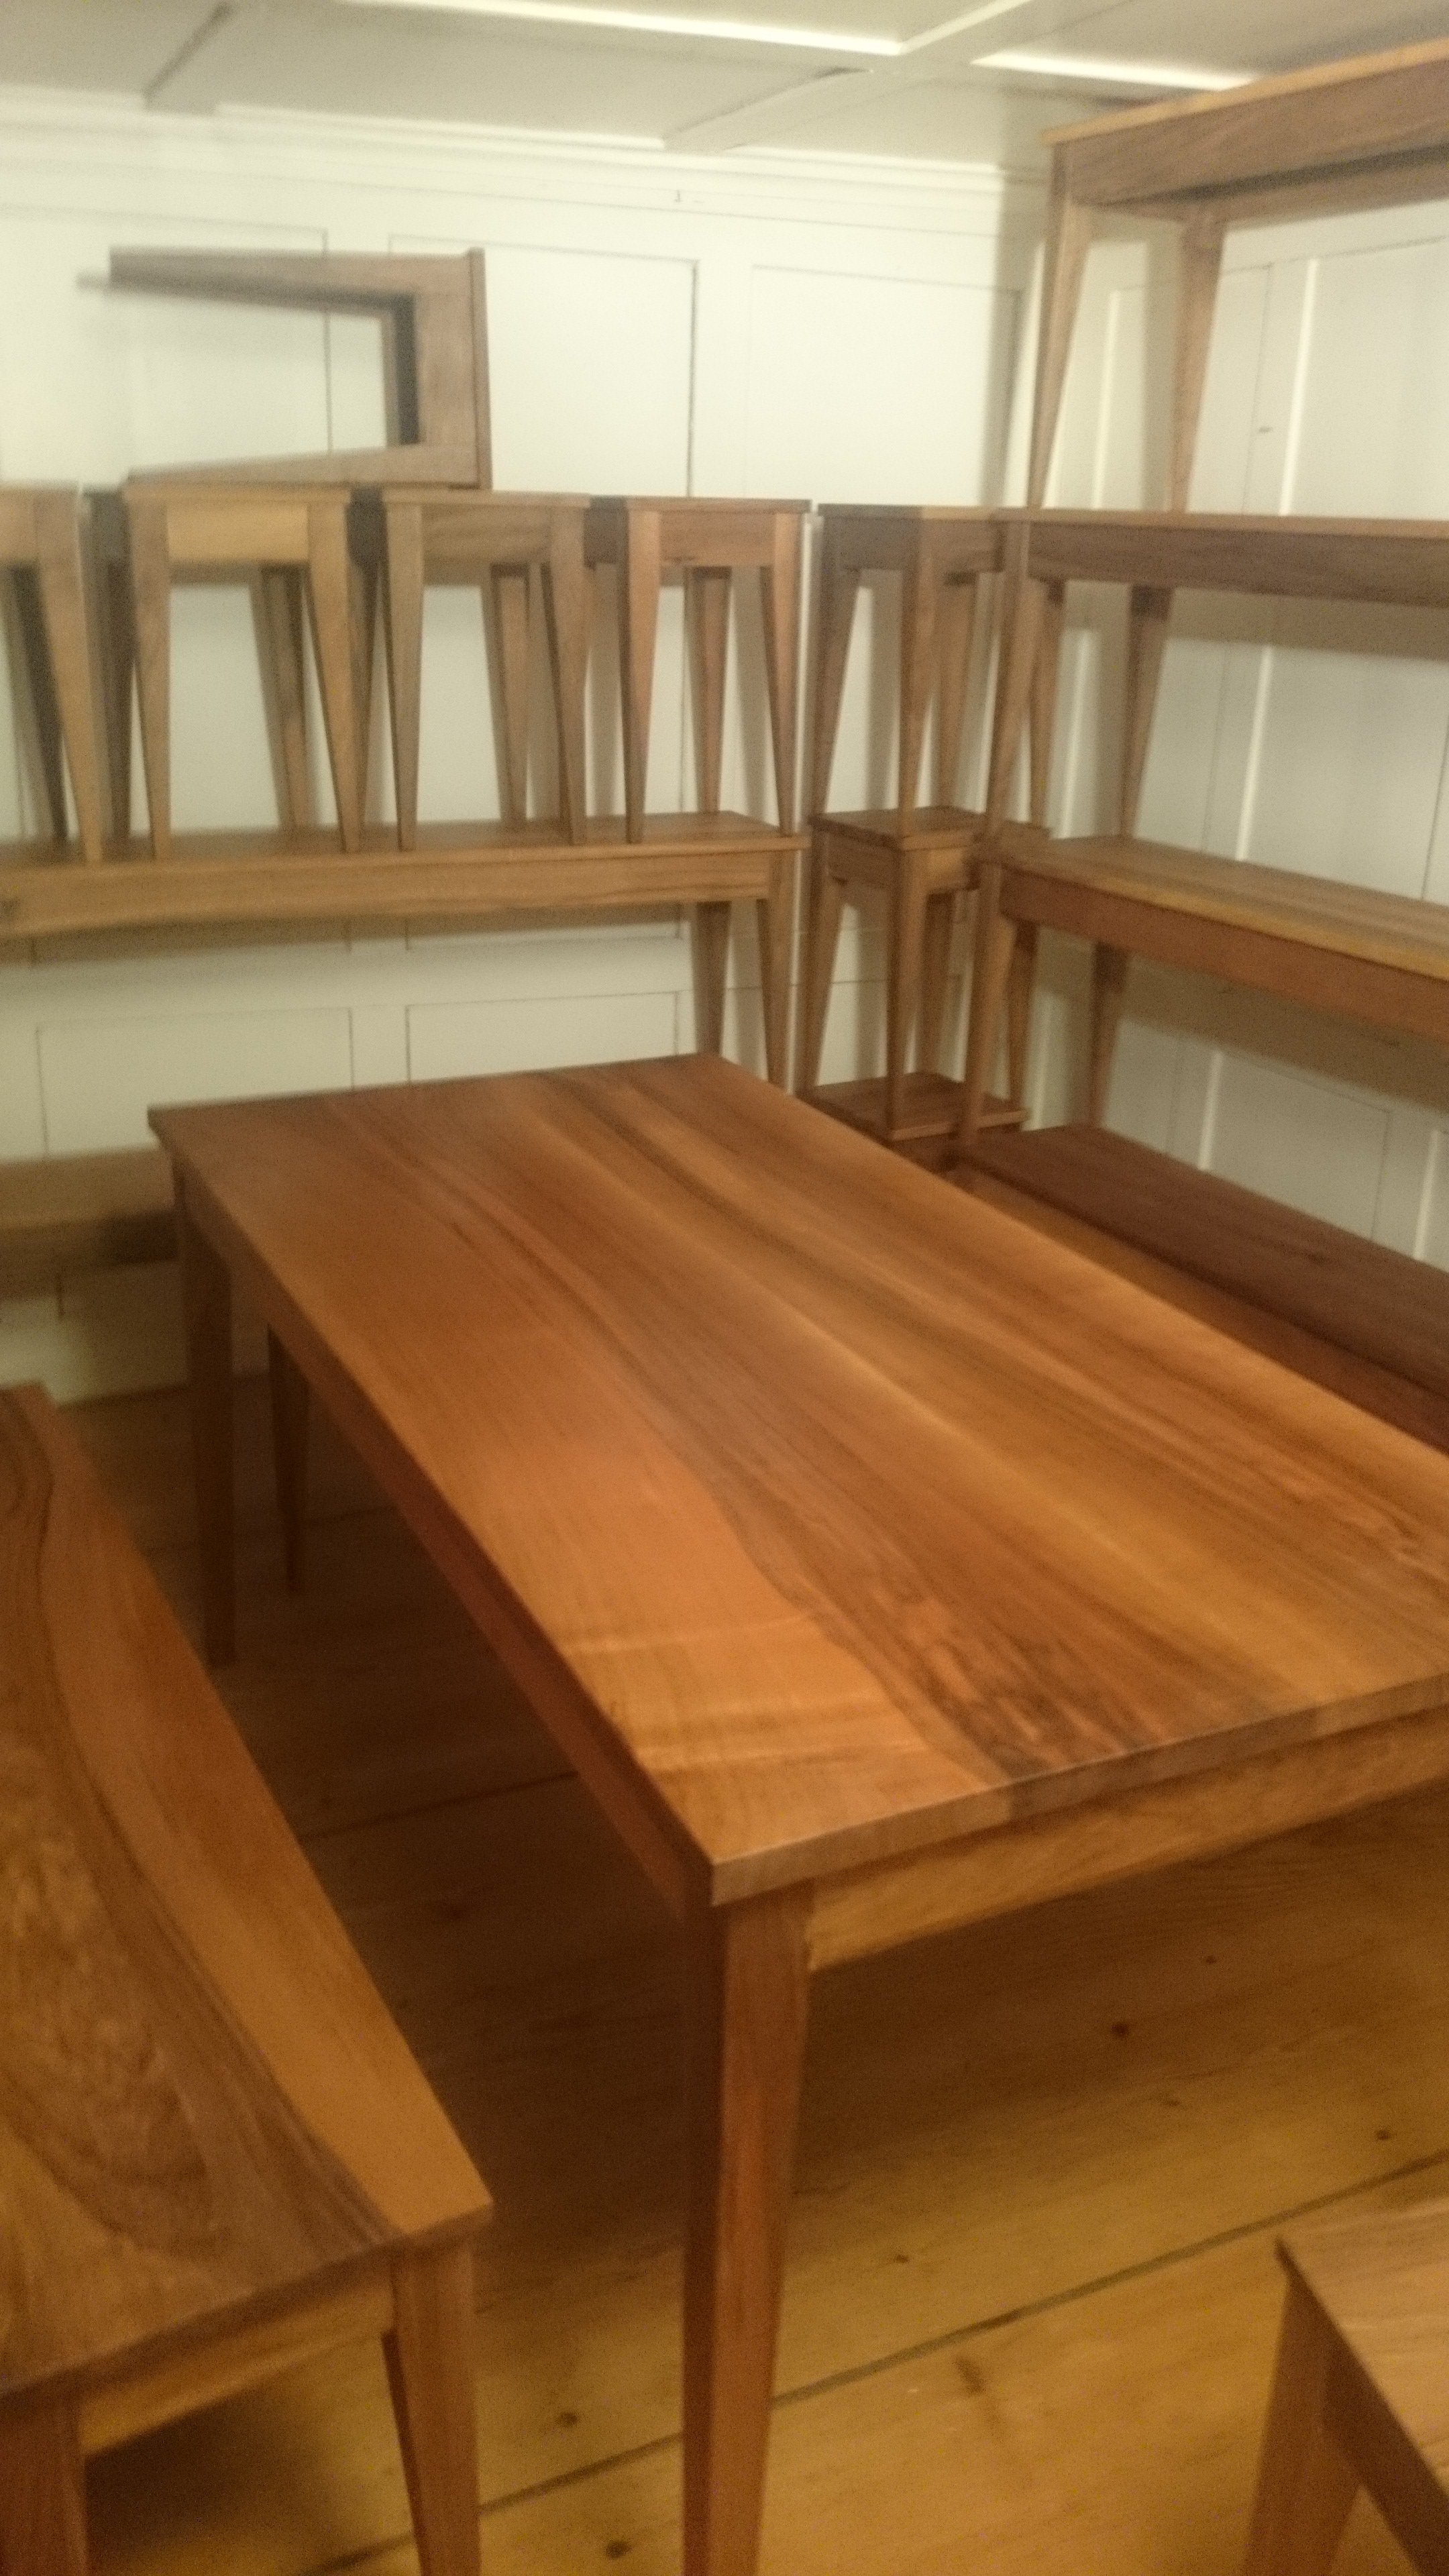 schnittpunkt koch. Black Bedroom Furniture Sets. Home Design Ideas